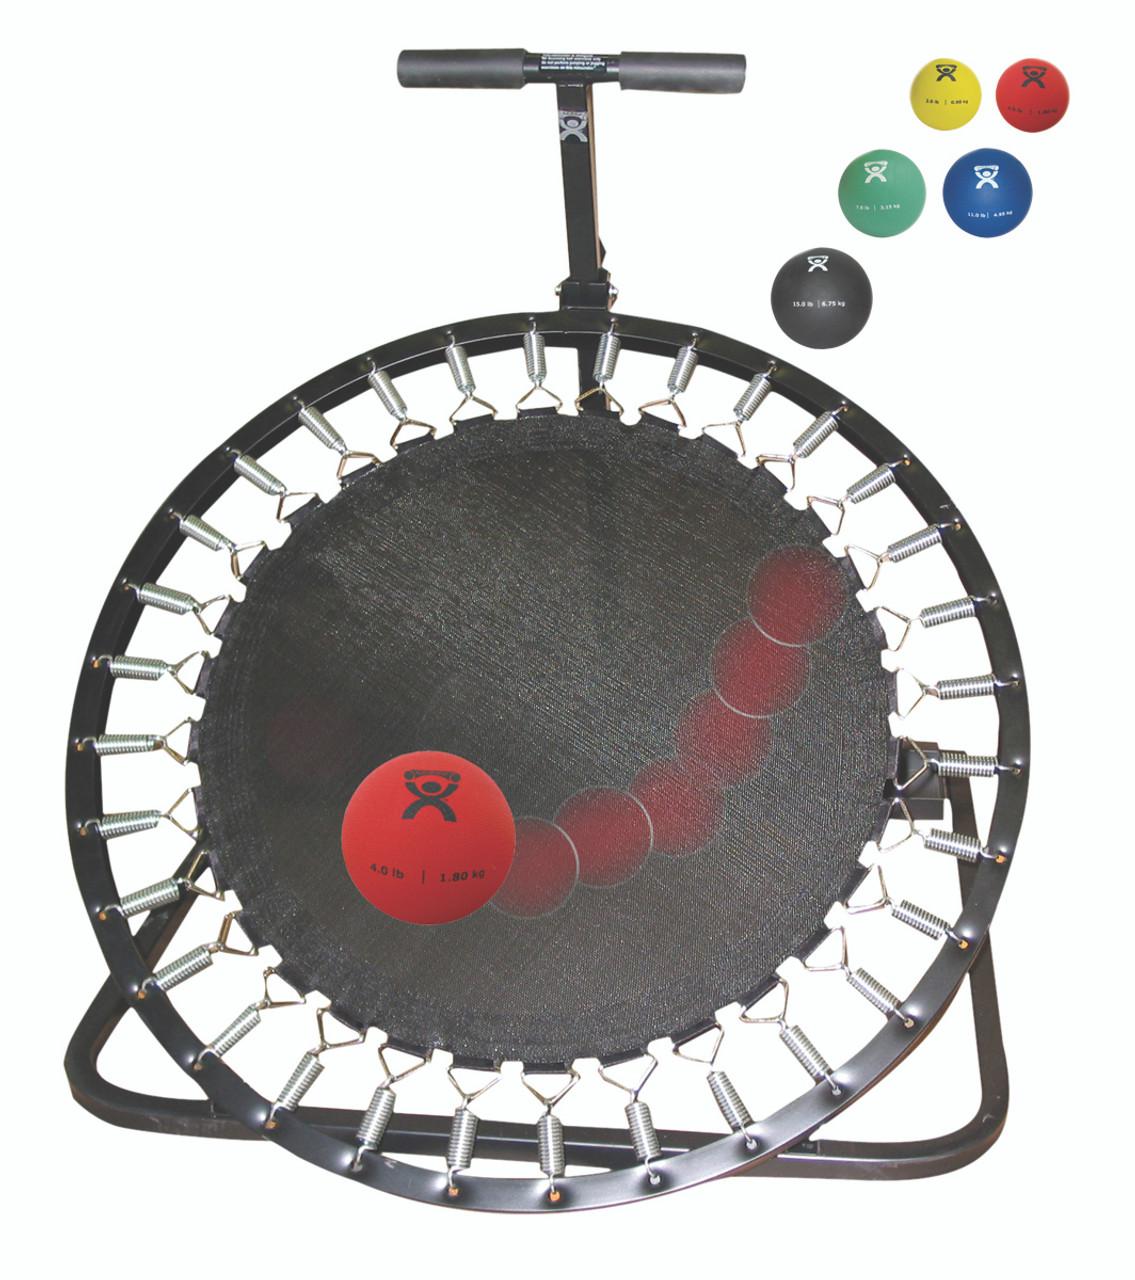 Adjustable Ball Rebounder - Set with Circular Rebounder, 1-tier Horizontal Plastic Rack, 5-balls (1 each: 2,4,7,11,15 lb)